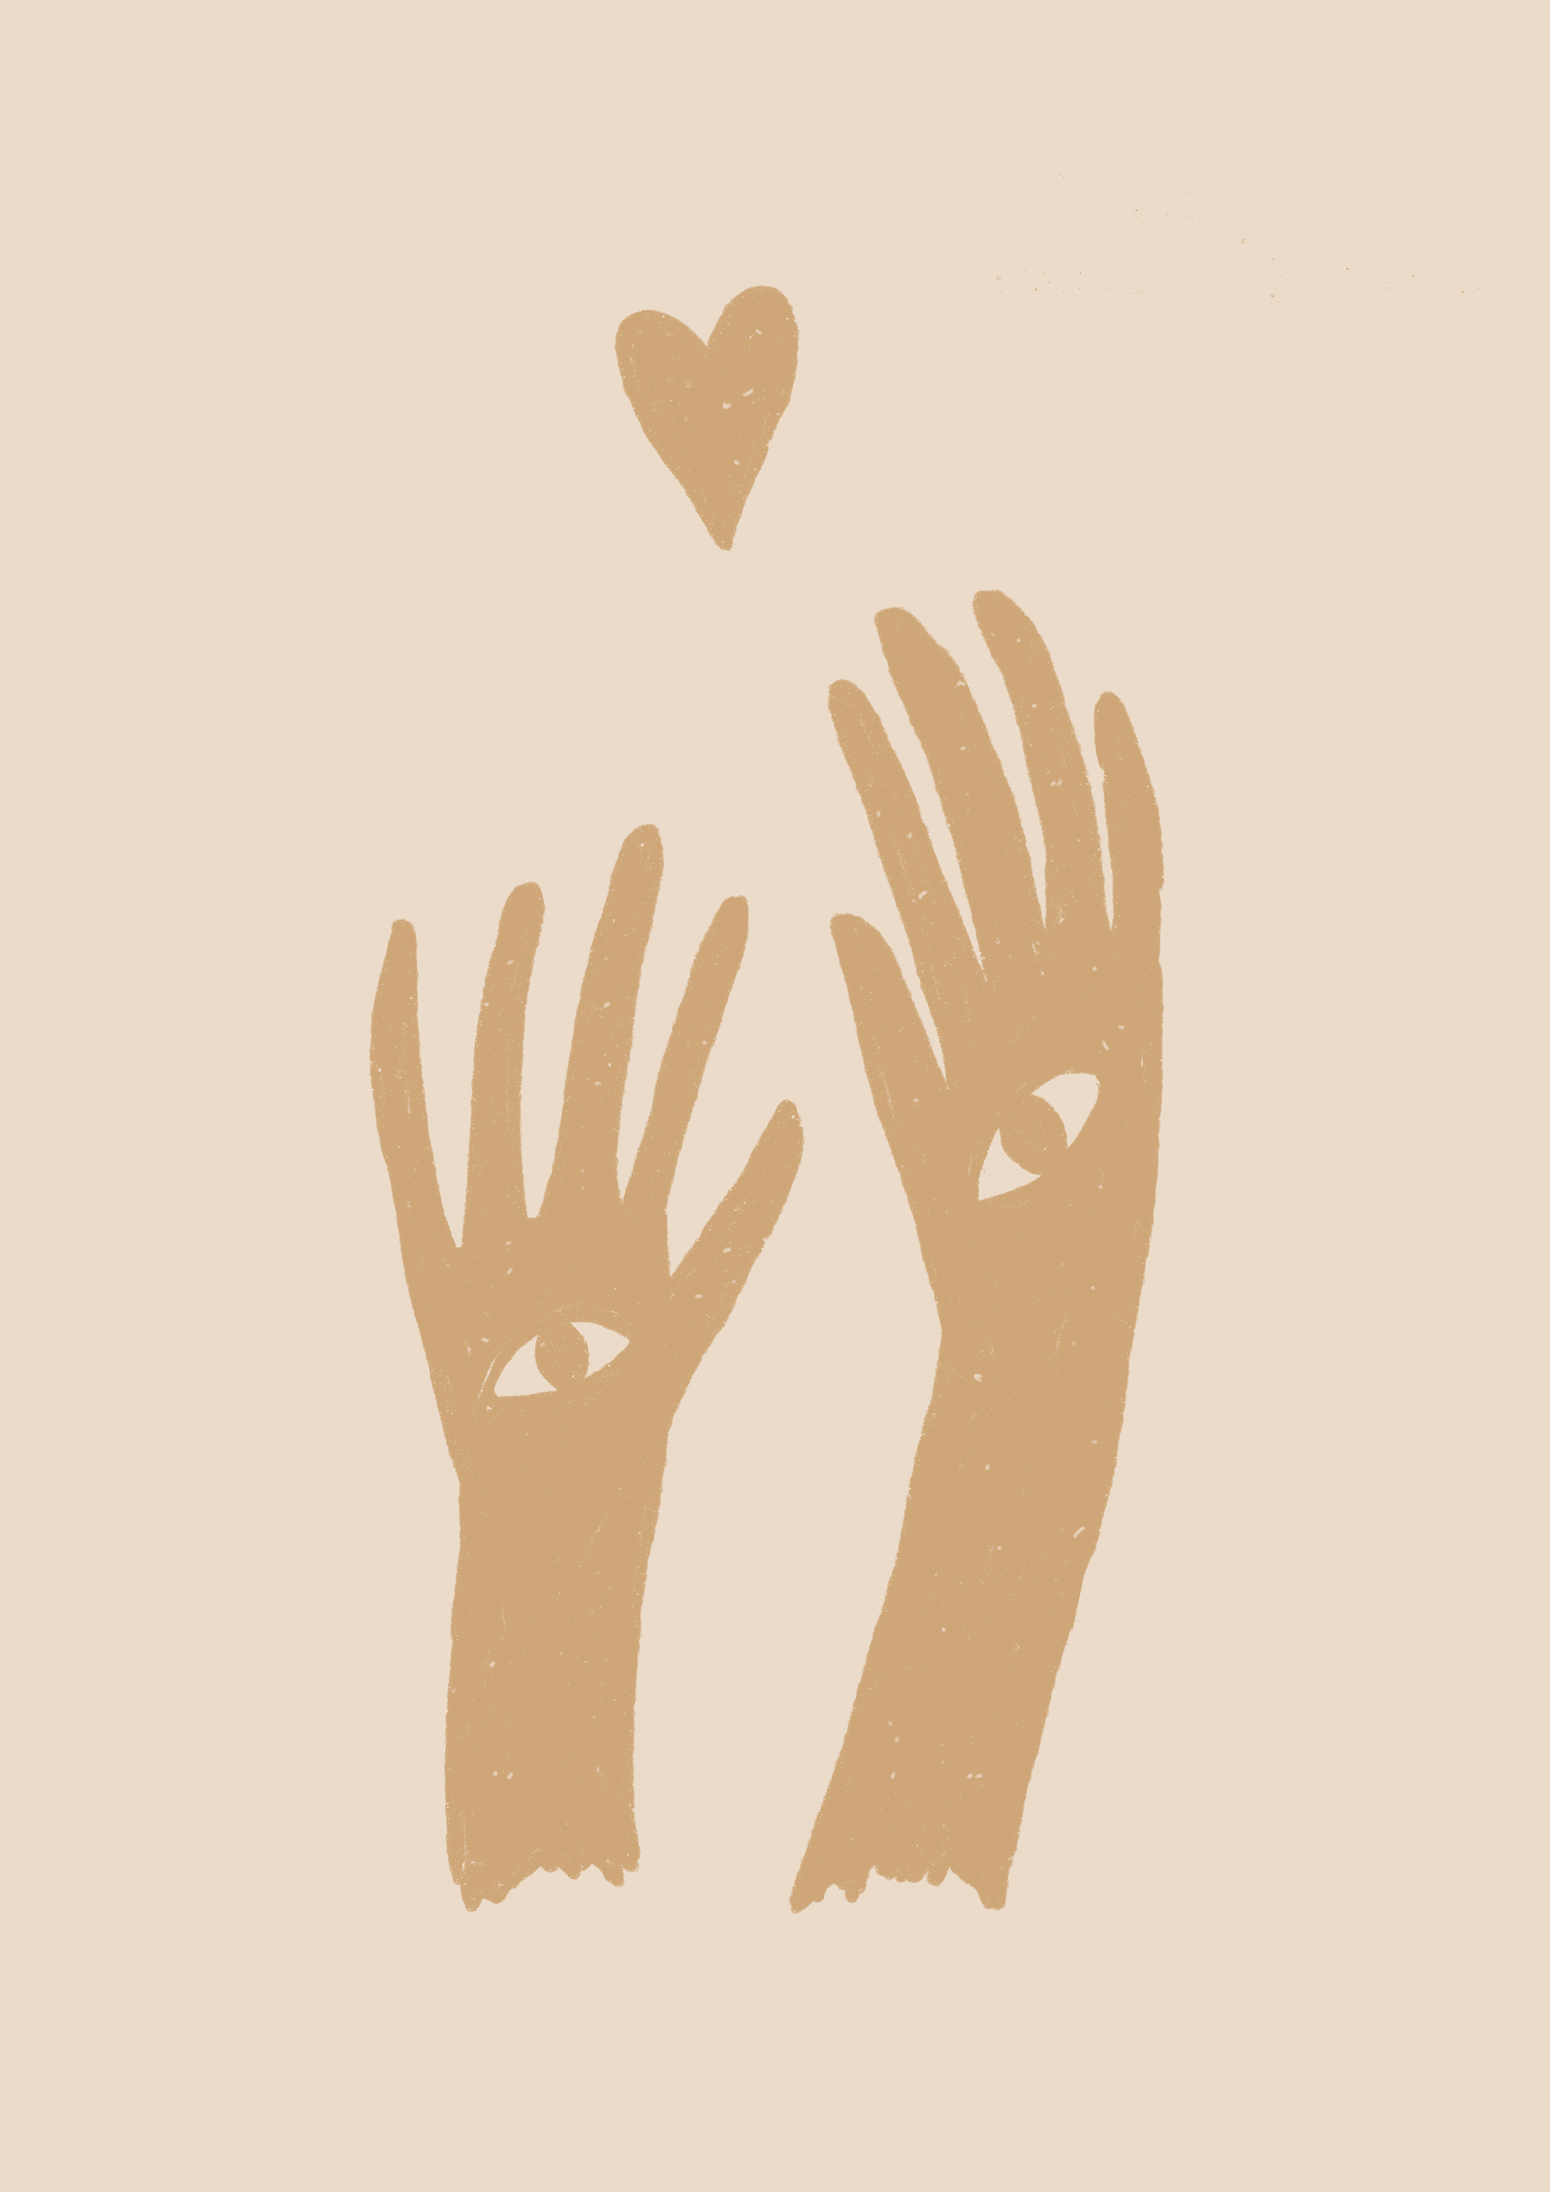 hands-gold